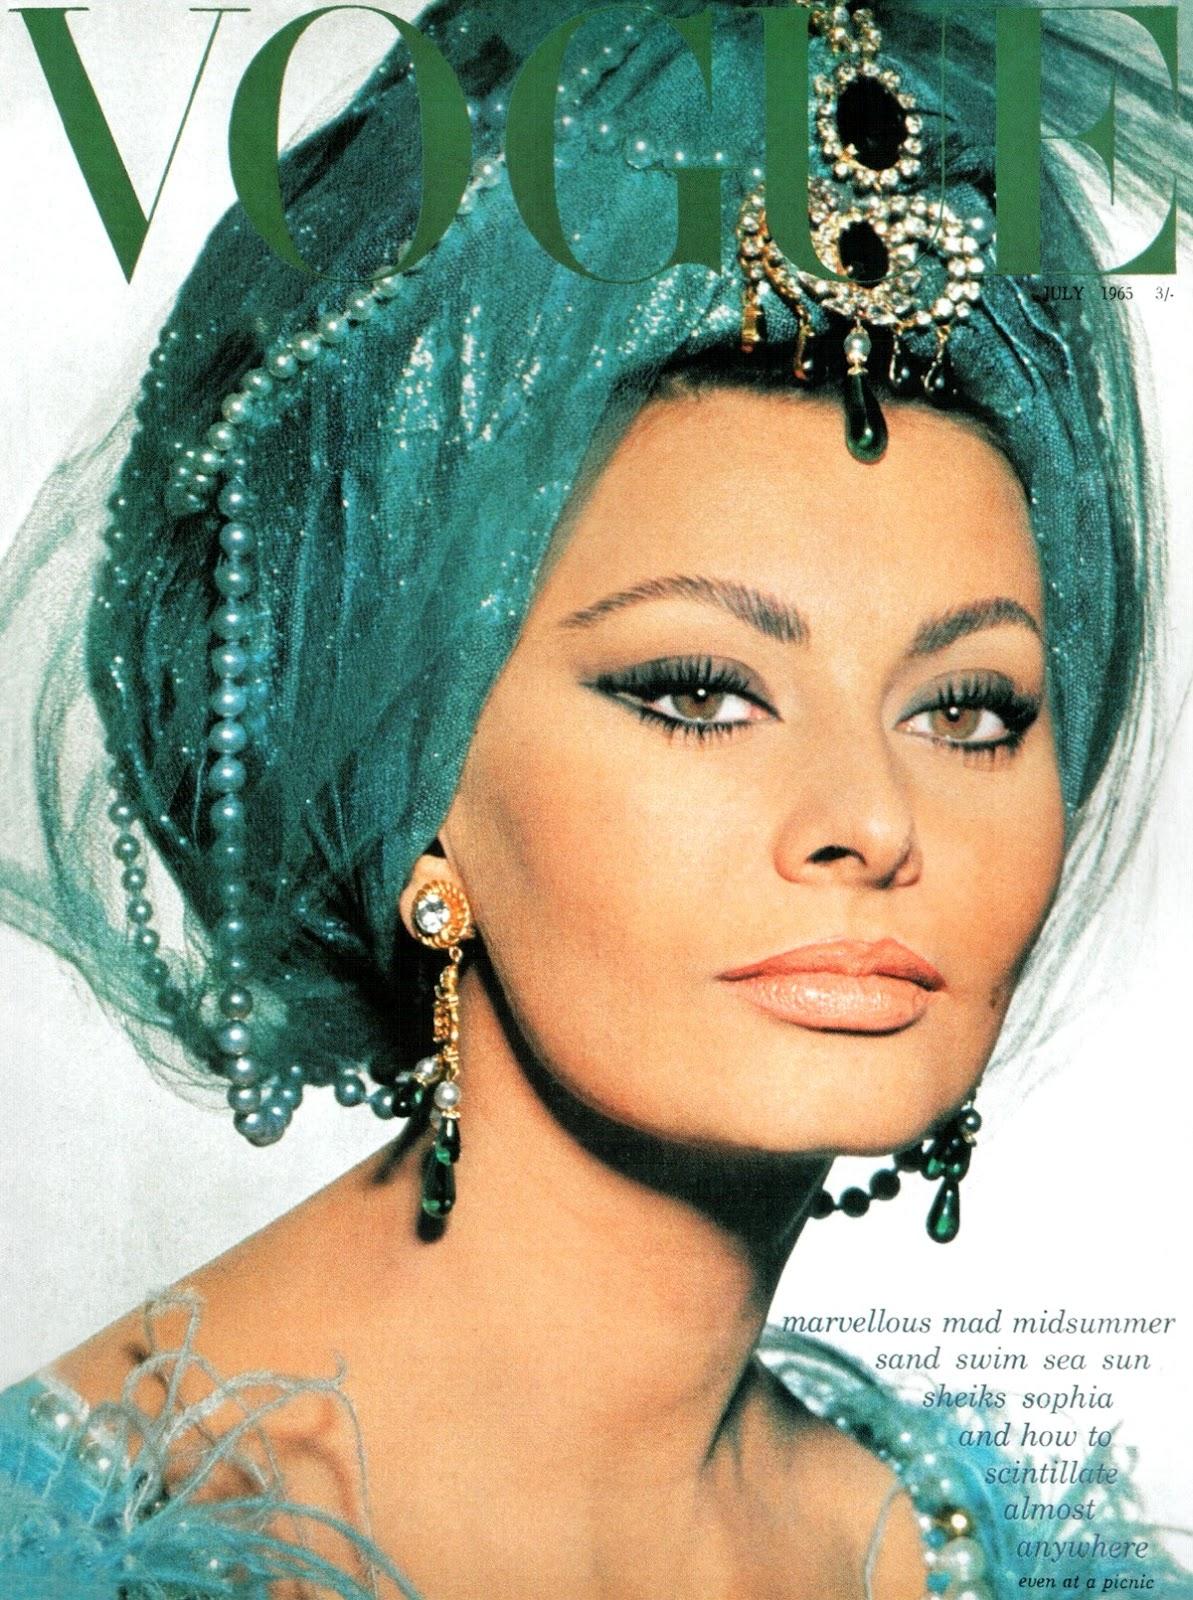 http://1.bp.blogspot.com/-lmZGJaaRgnU/T6G-dasnhwI/AAAAAAAACxo/WsfbeNbbCbw/s1600/1965_July_Sophia_Loren_by_David_Bailey.jpg